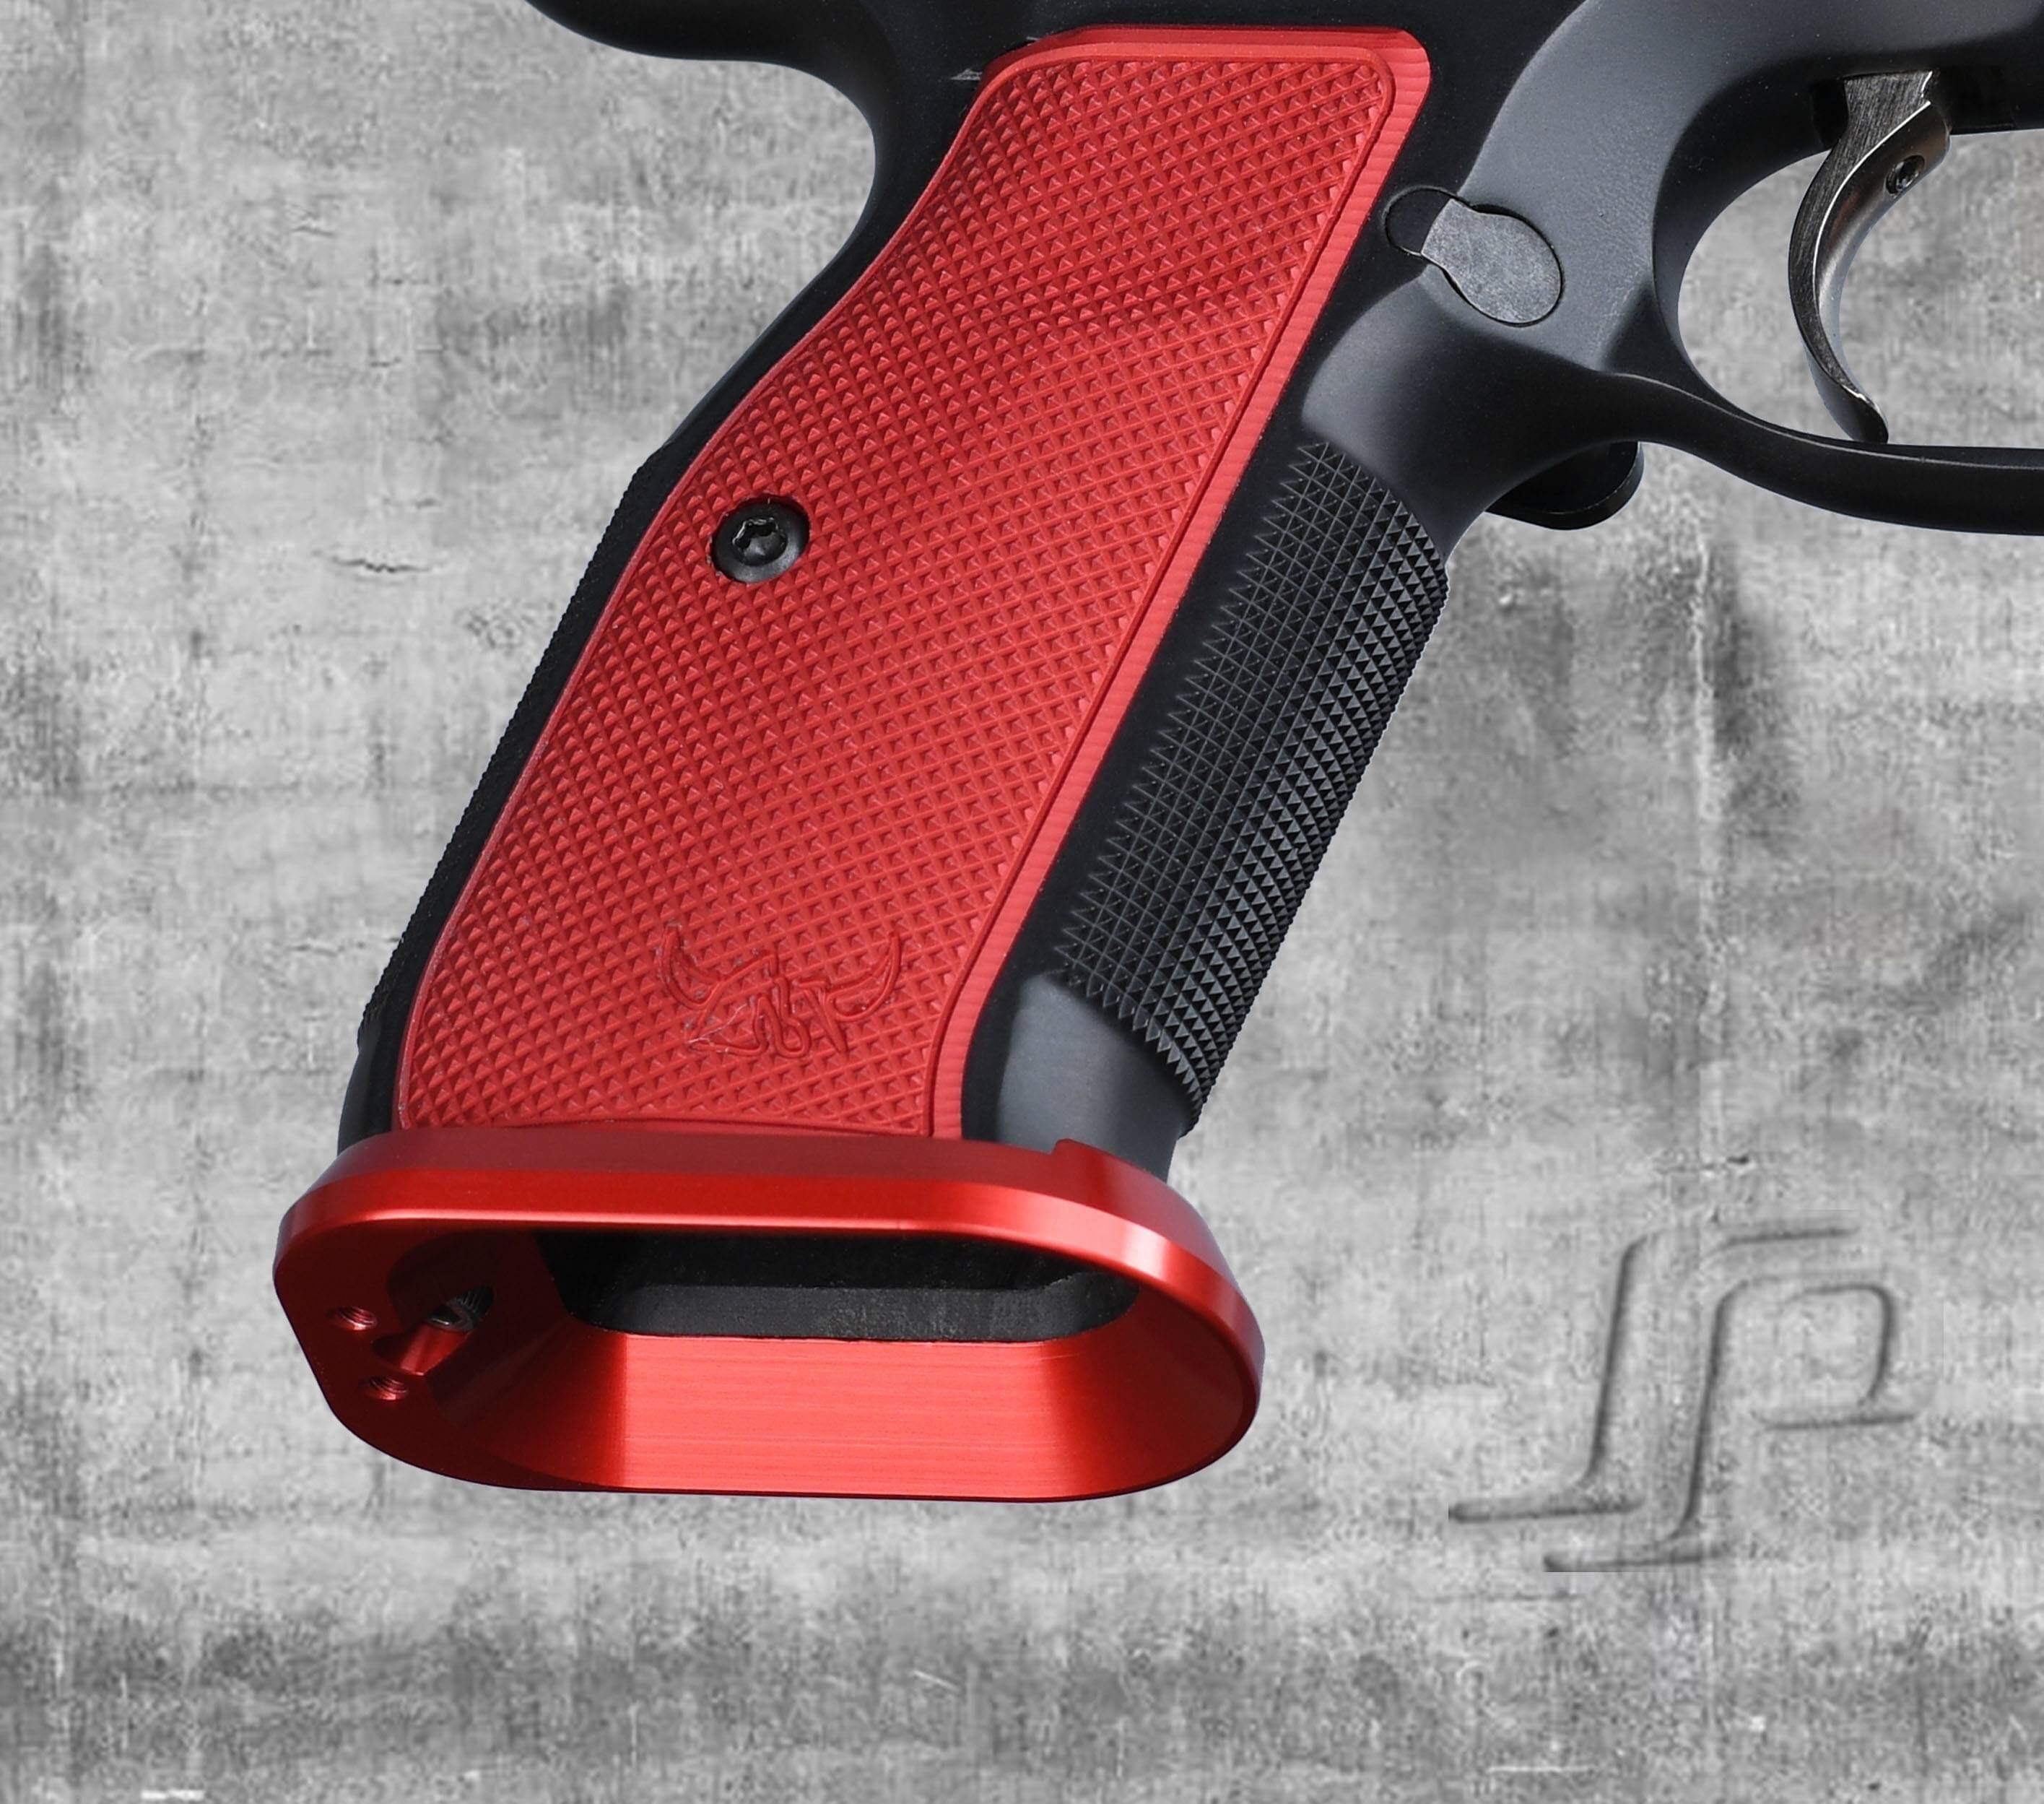 Springer Precision CZ75 & Shadow 2 ESP magwell